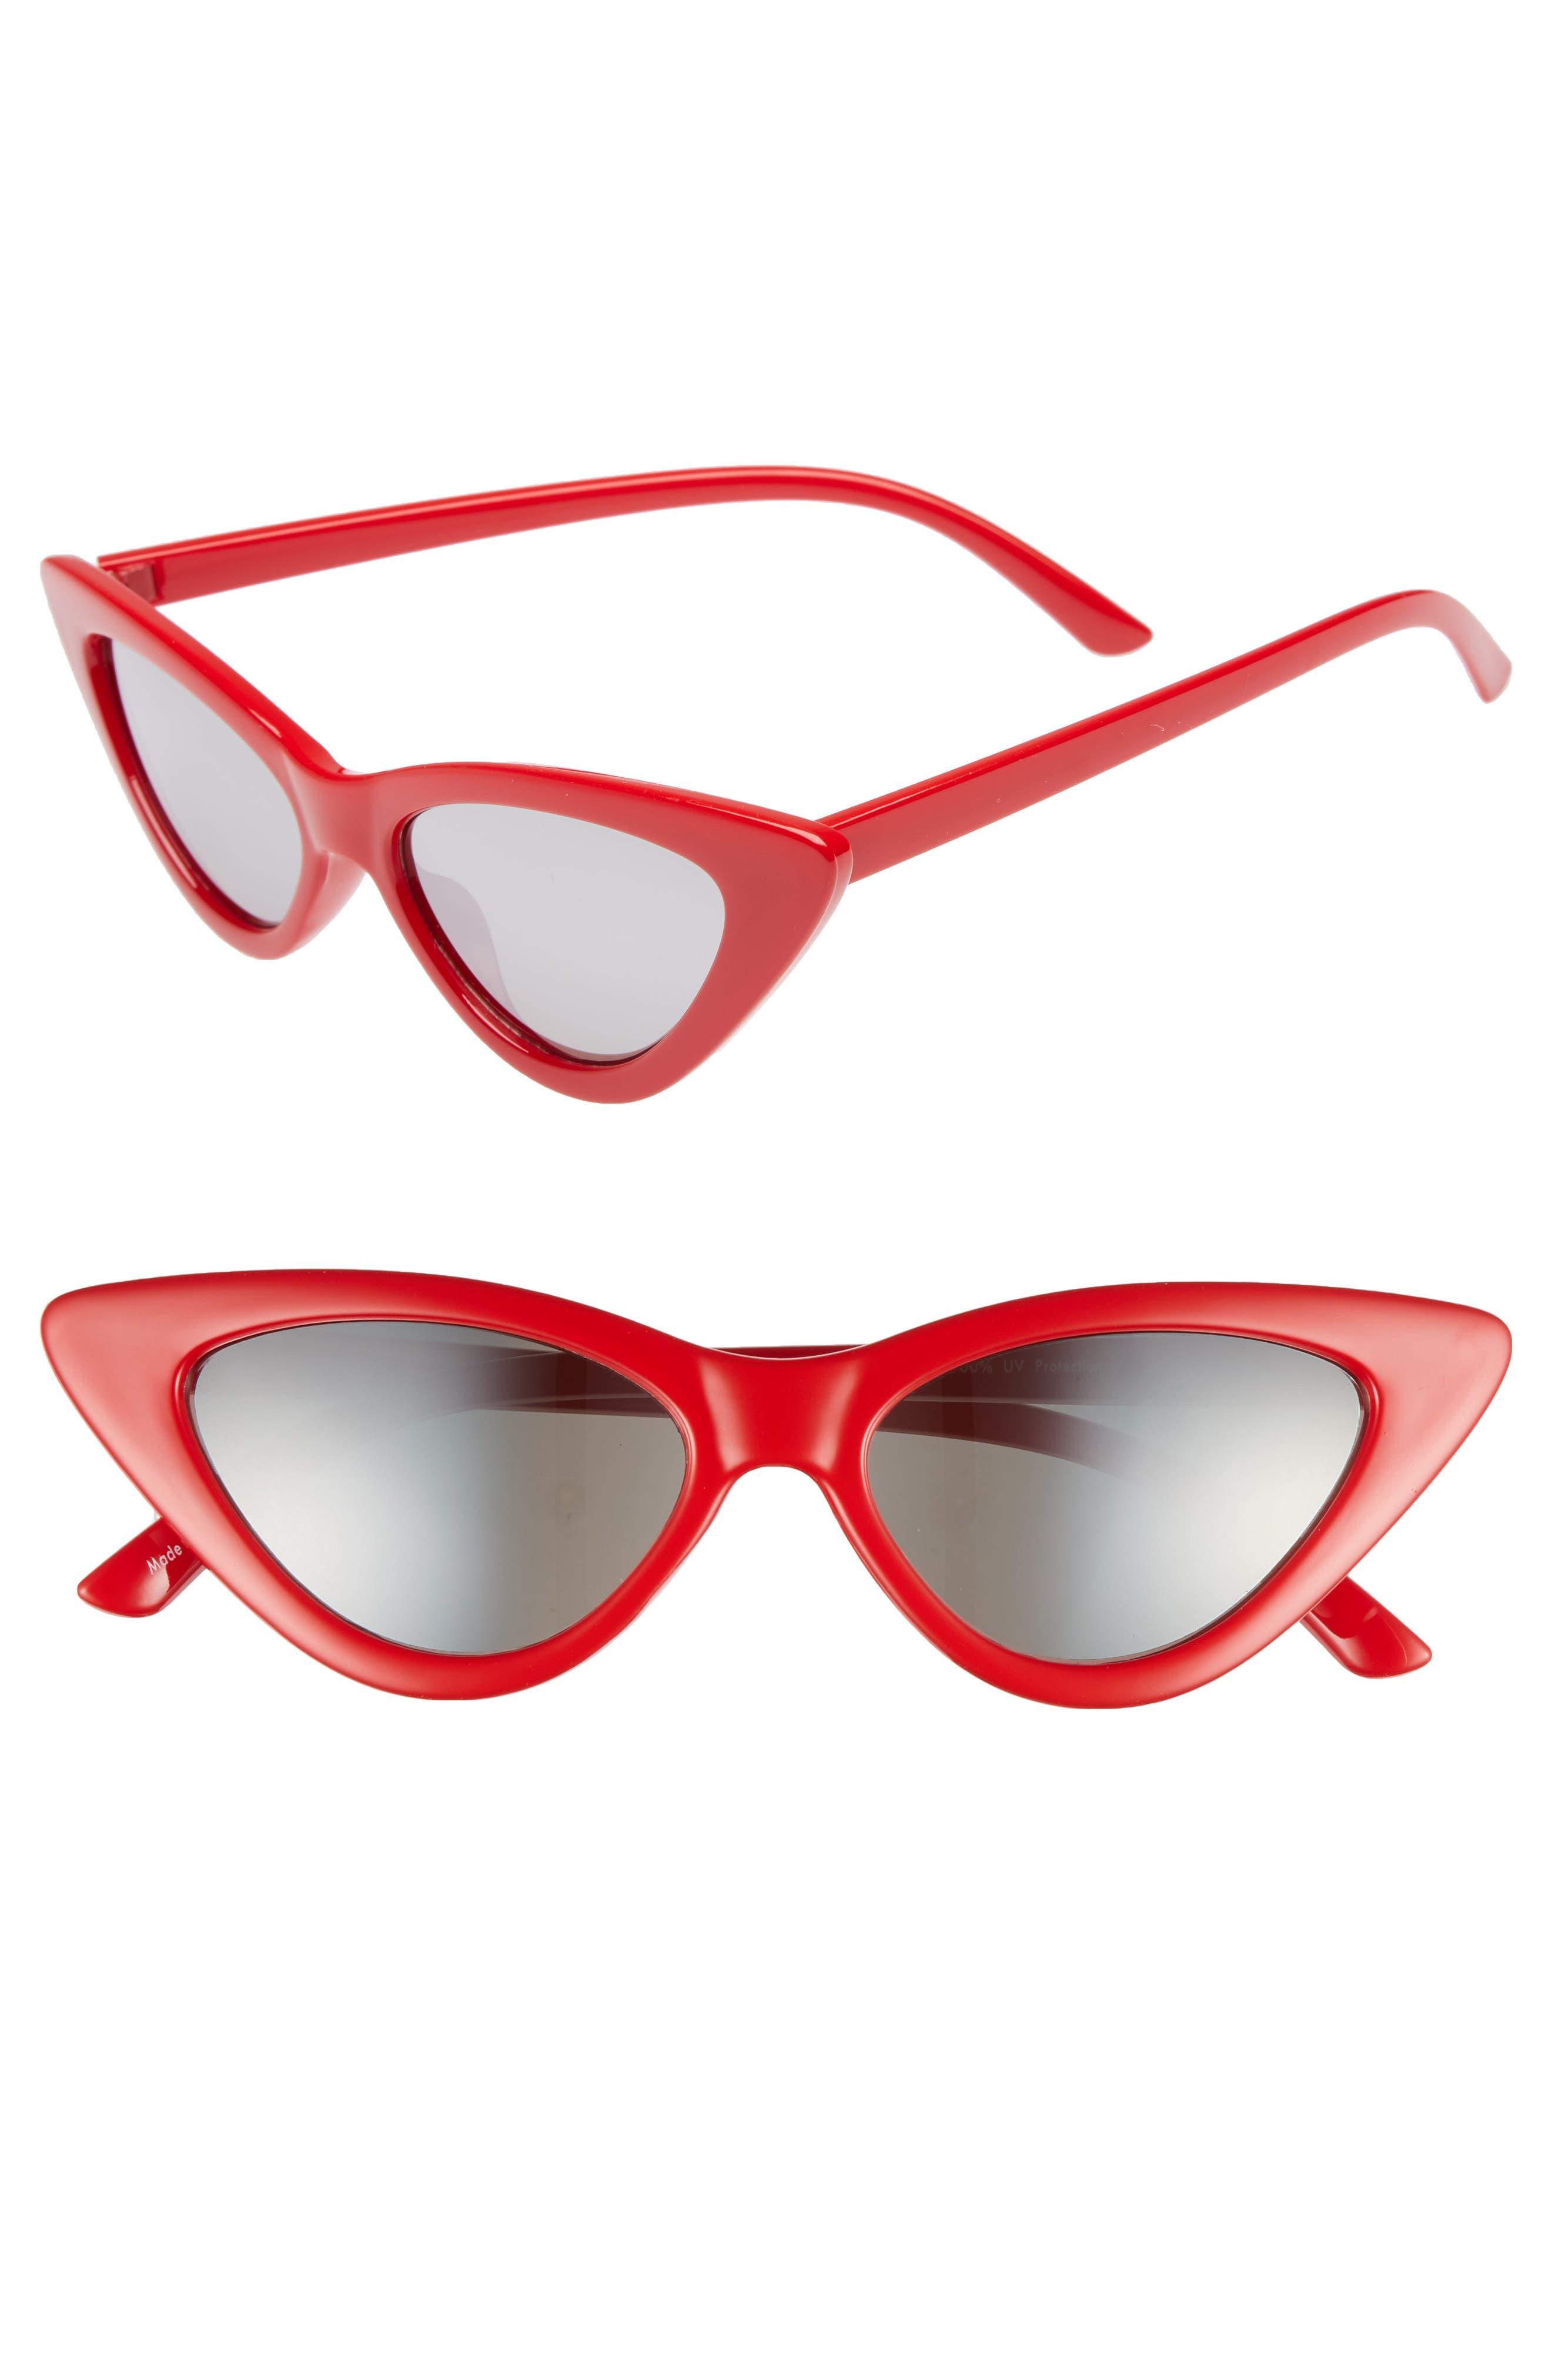 62mm Cat Eye Sunglasses,                             Main thumbnail 2, color,